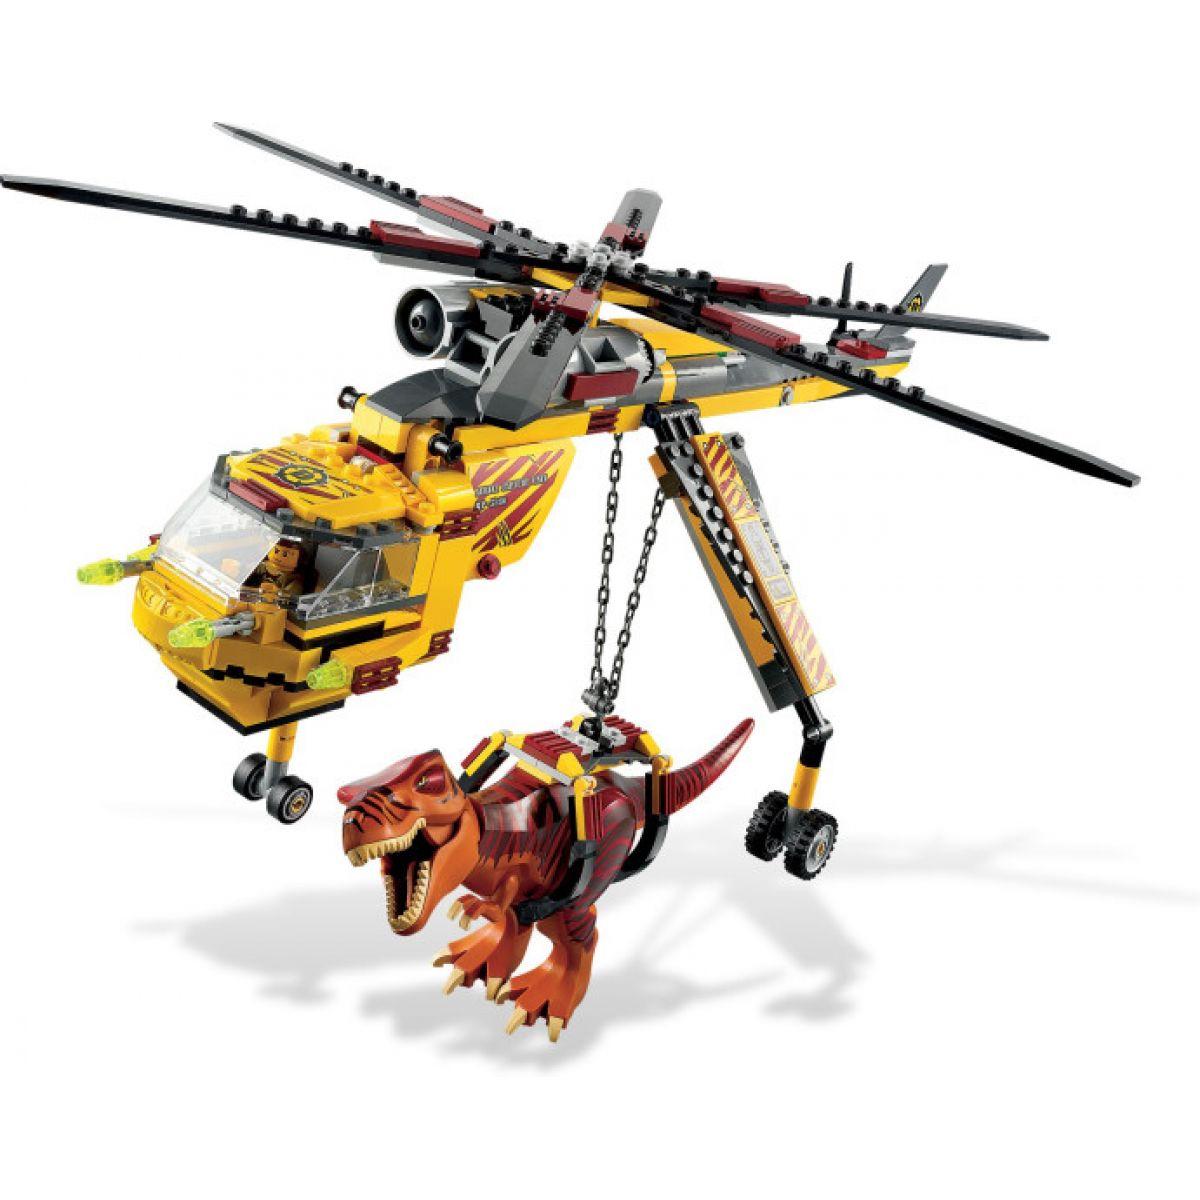 LEGO Dino 5886 Lovec T-Rexů #4